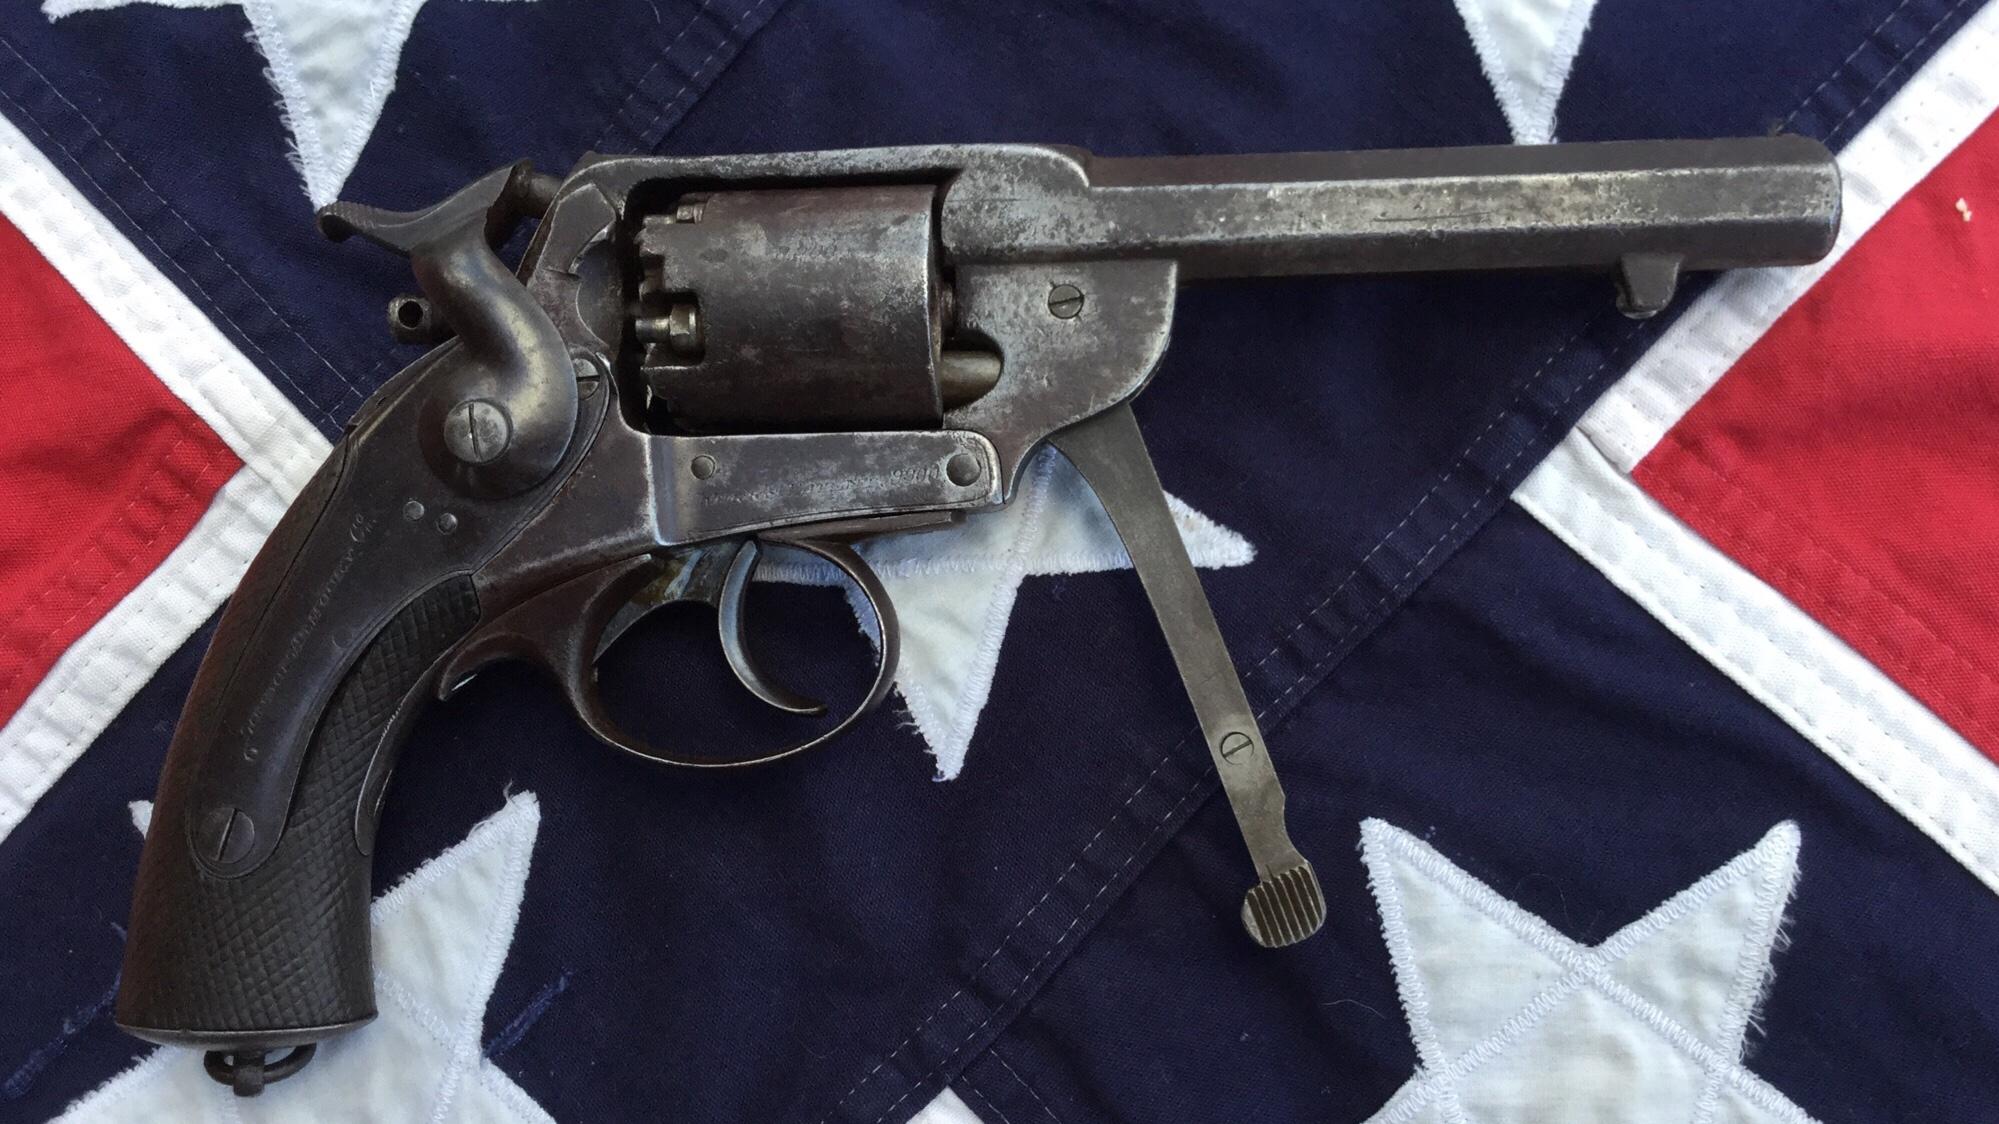 Kerr Revolver, Rammer Lever